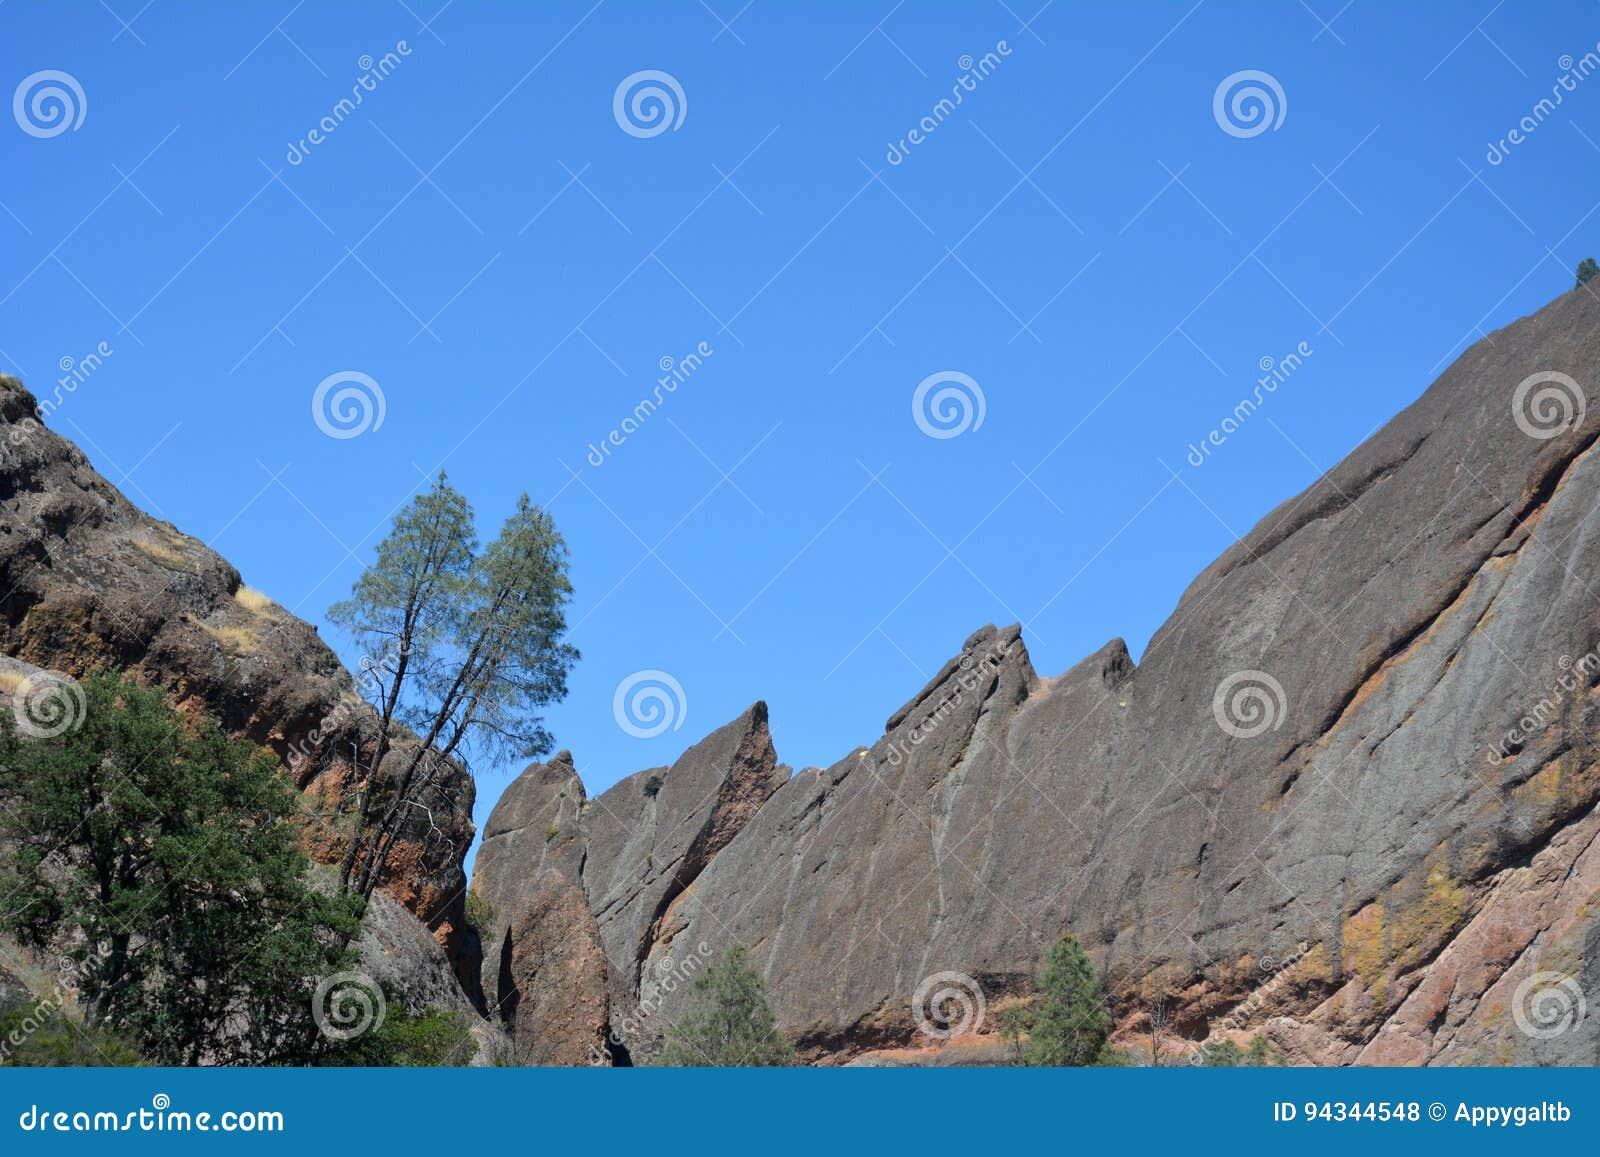 Pinnacles national park machete Ridge with trees